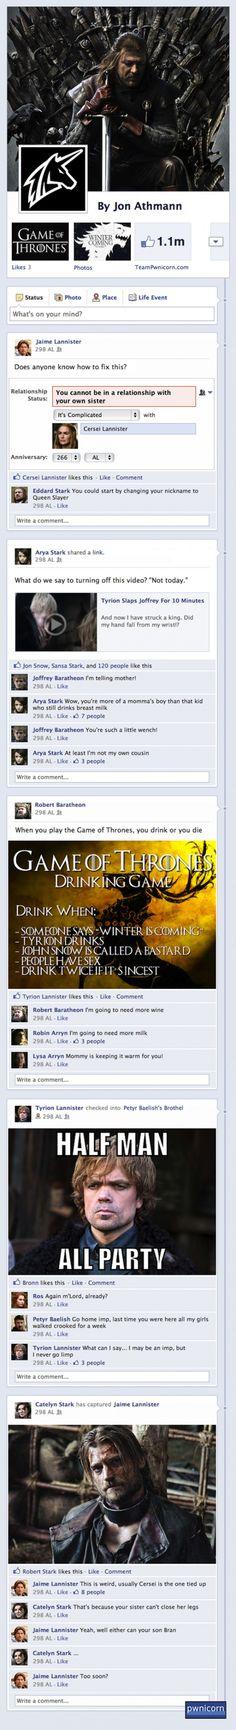 #gameofthrones #got #facebook